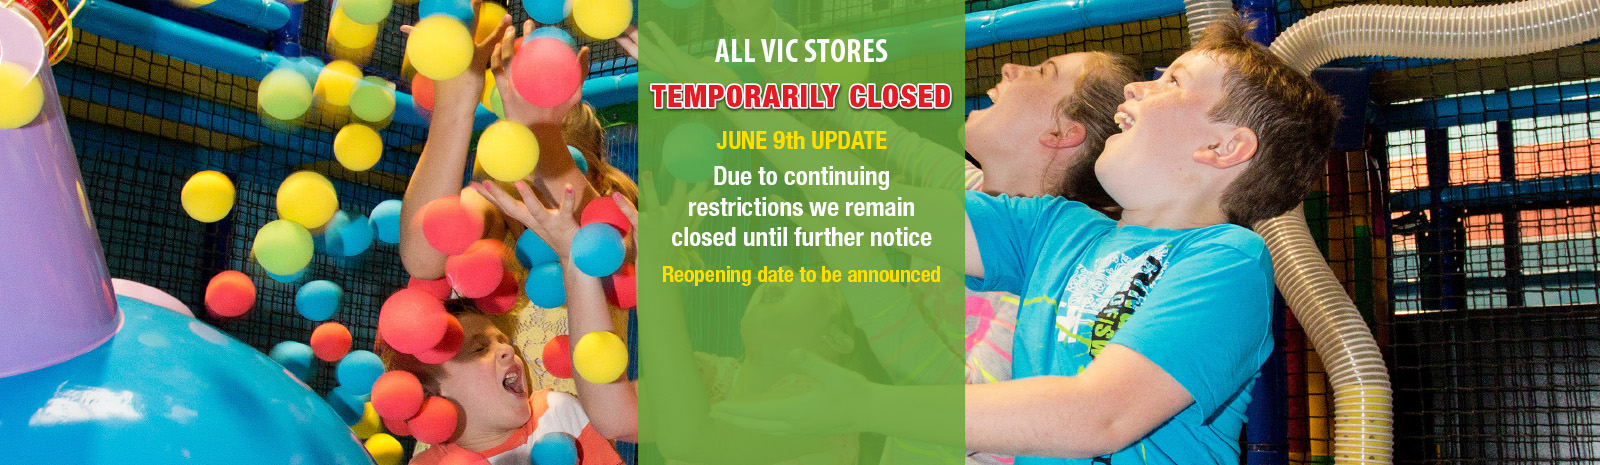 vic-closed-june9